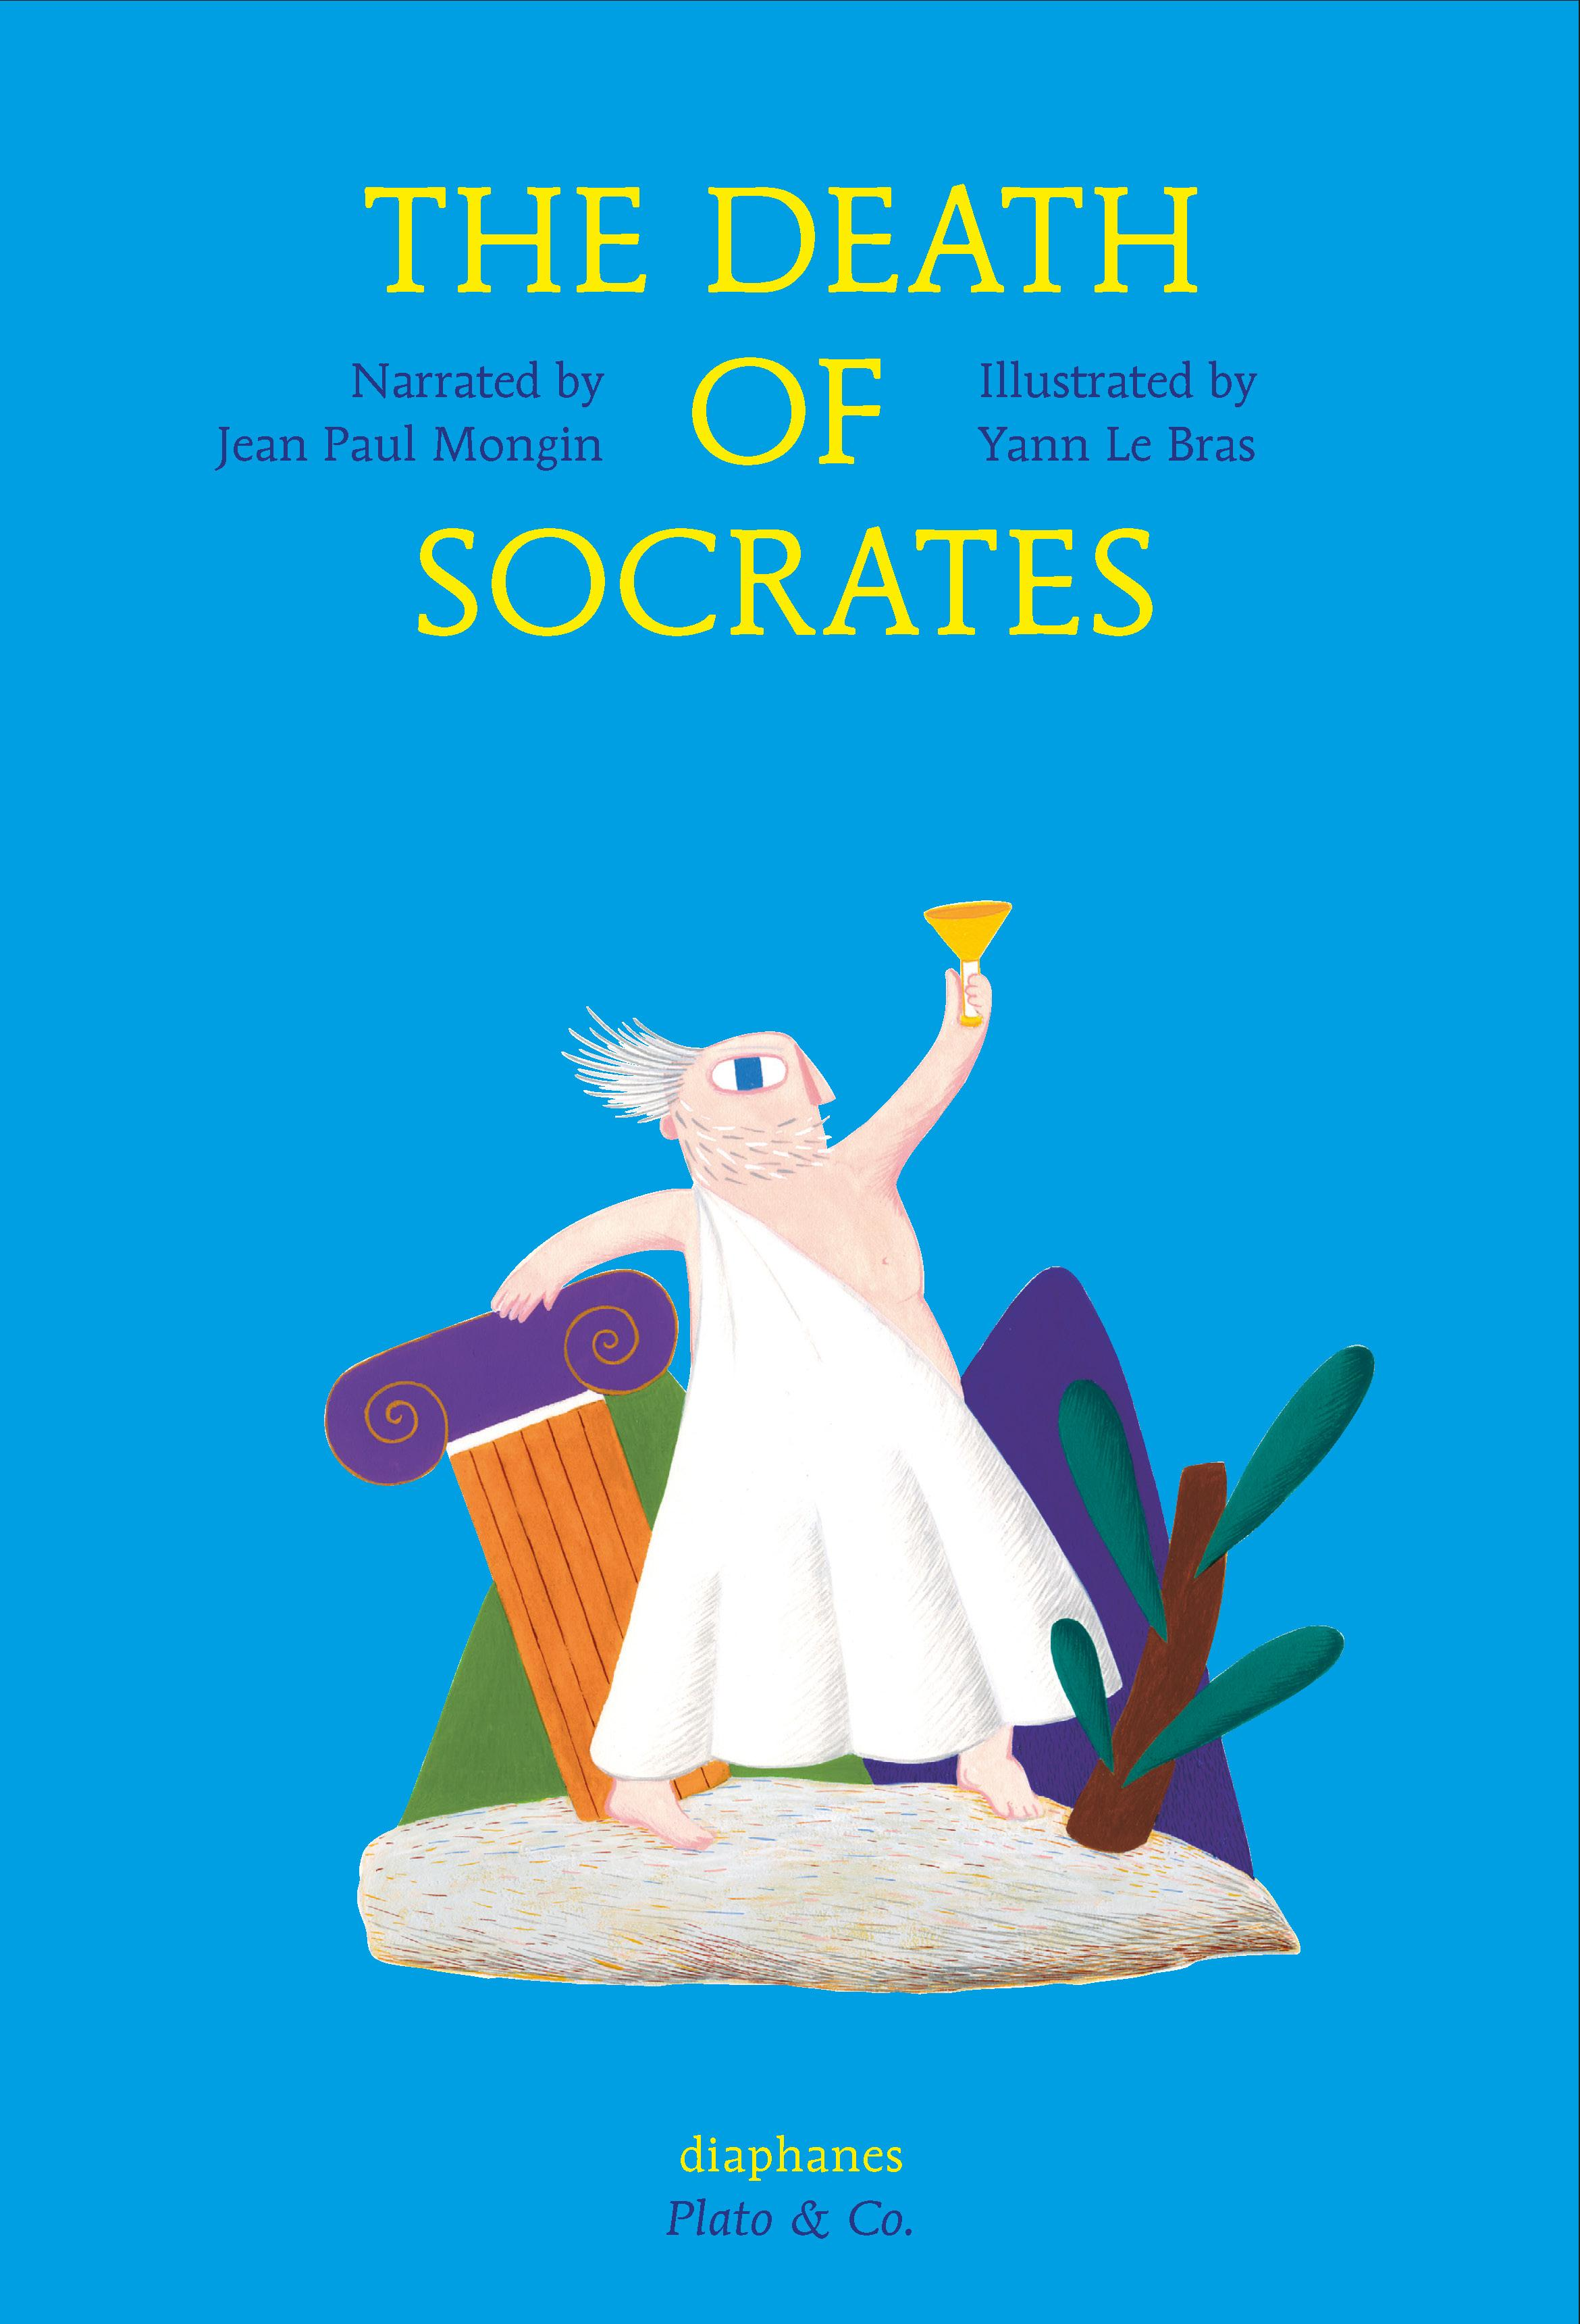 The-Death-of-Socrates-Yann-Le-Bras